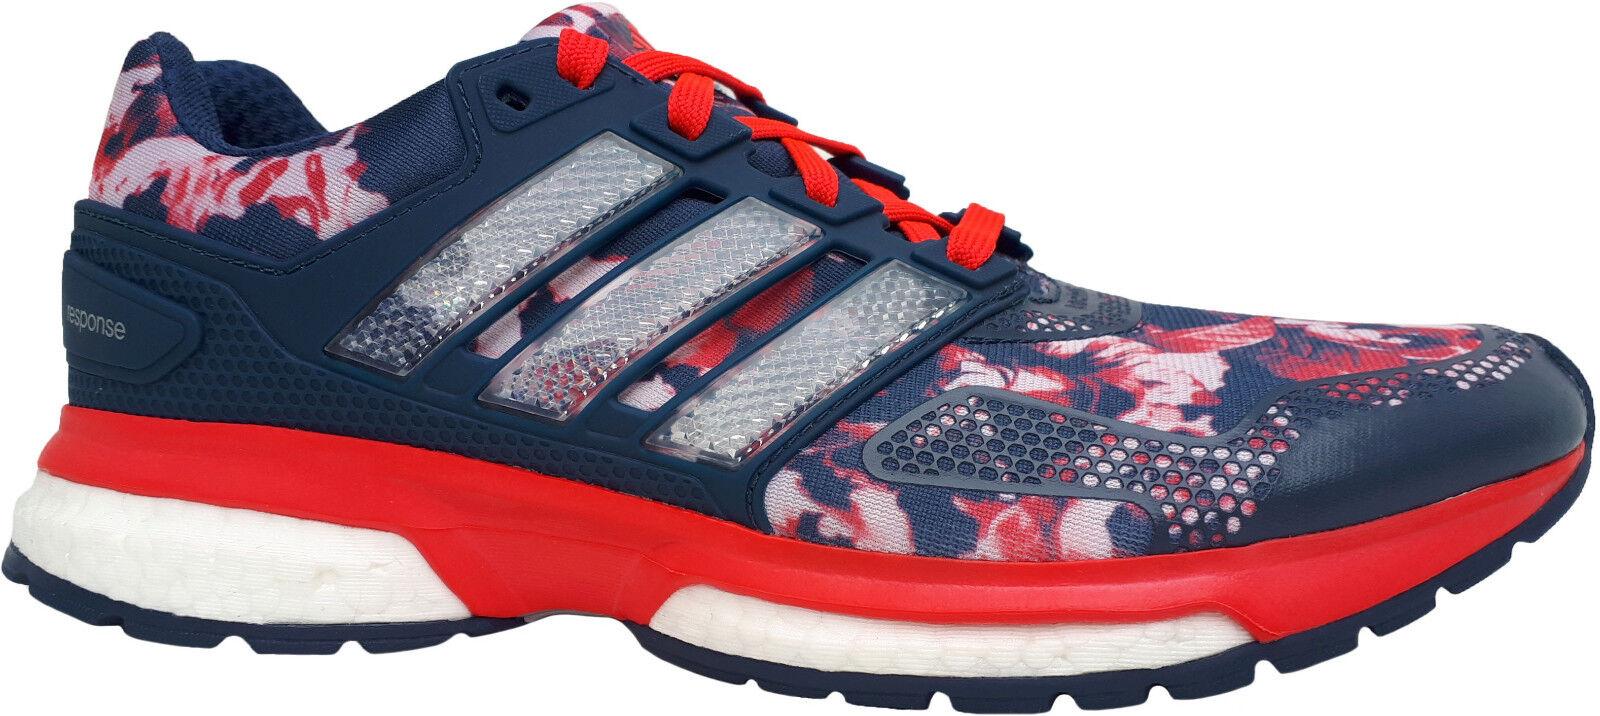 Adidas Responce 2 Graphic W zapatillas talla 38 Fitness 2/3 cortos deporte zapatos Fitness 38 b1a497